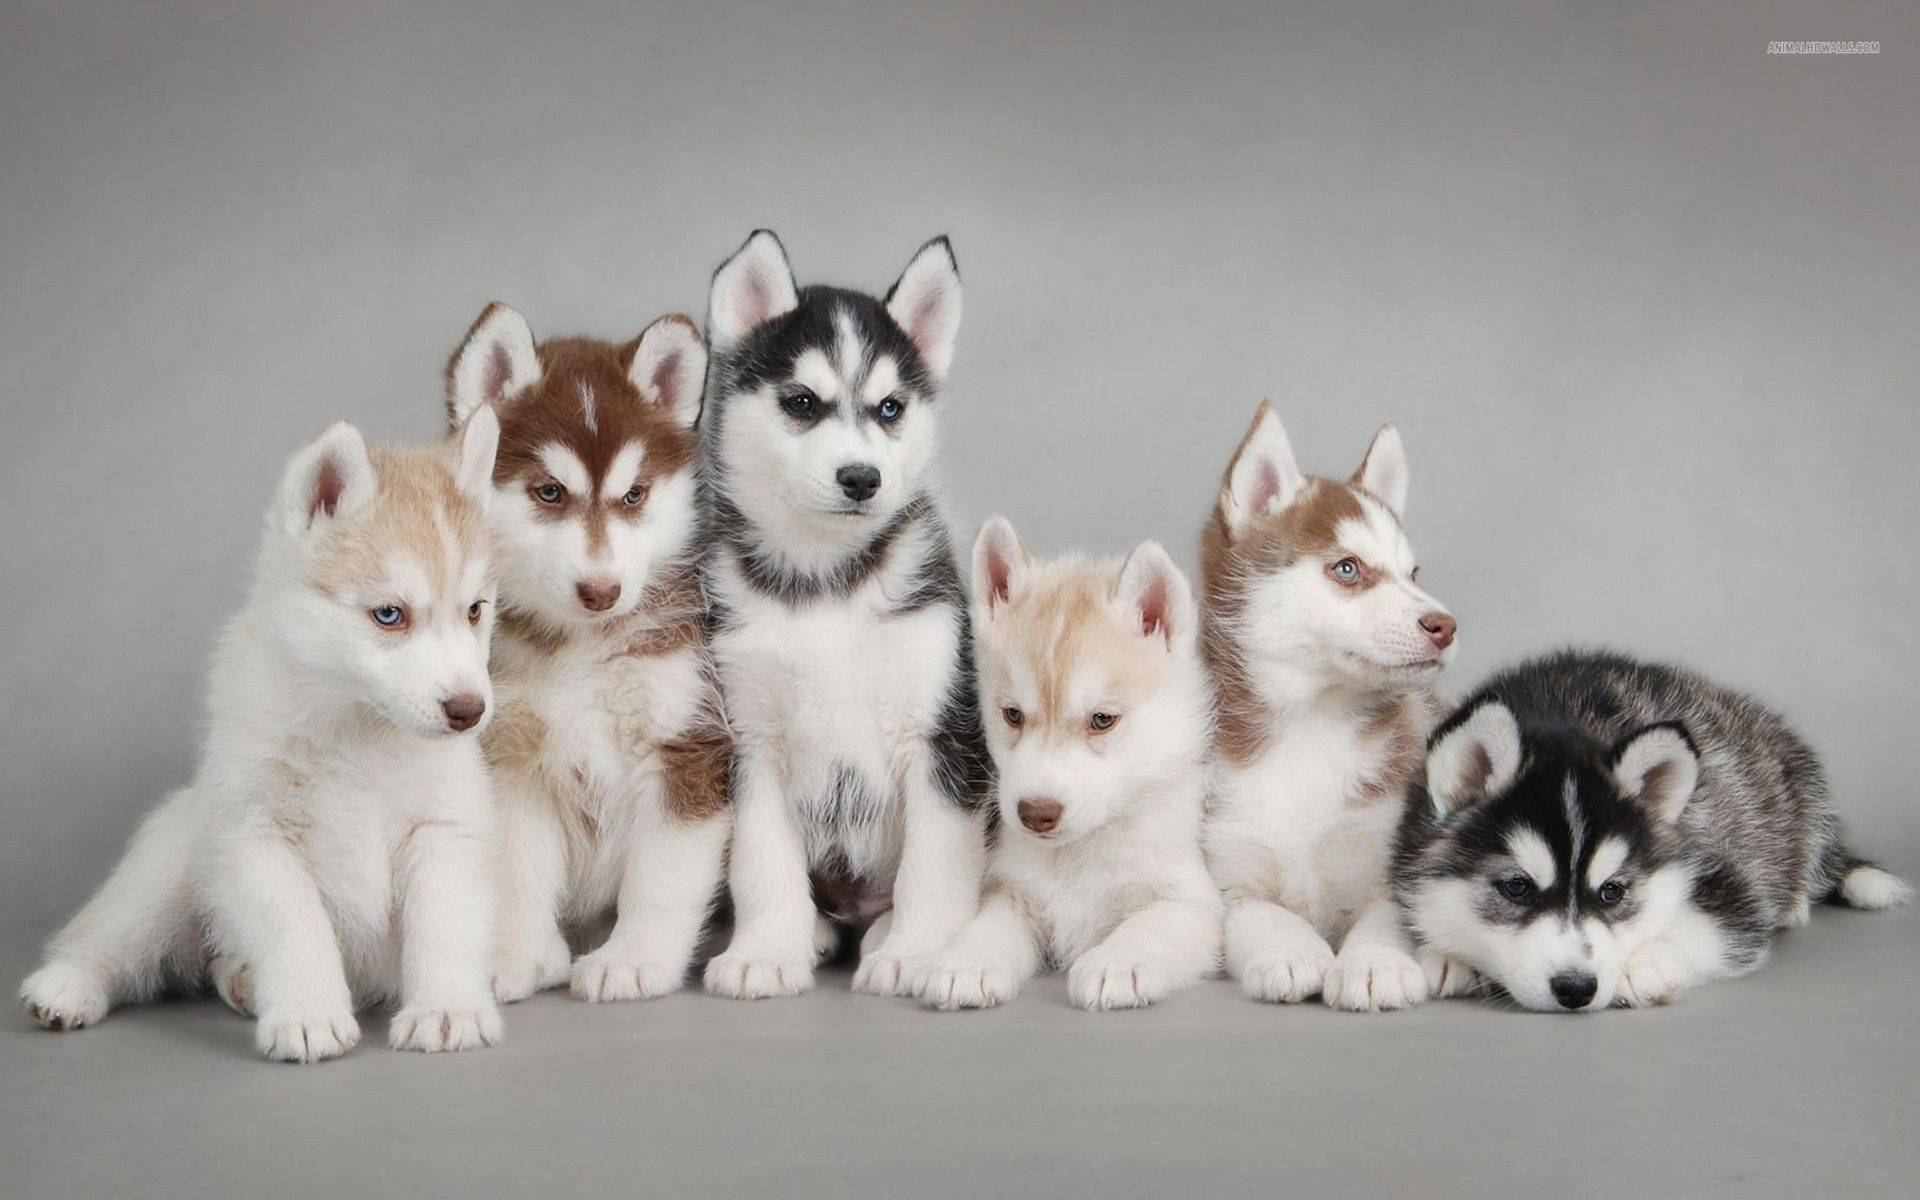 Husky with puppies photo